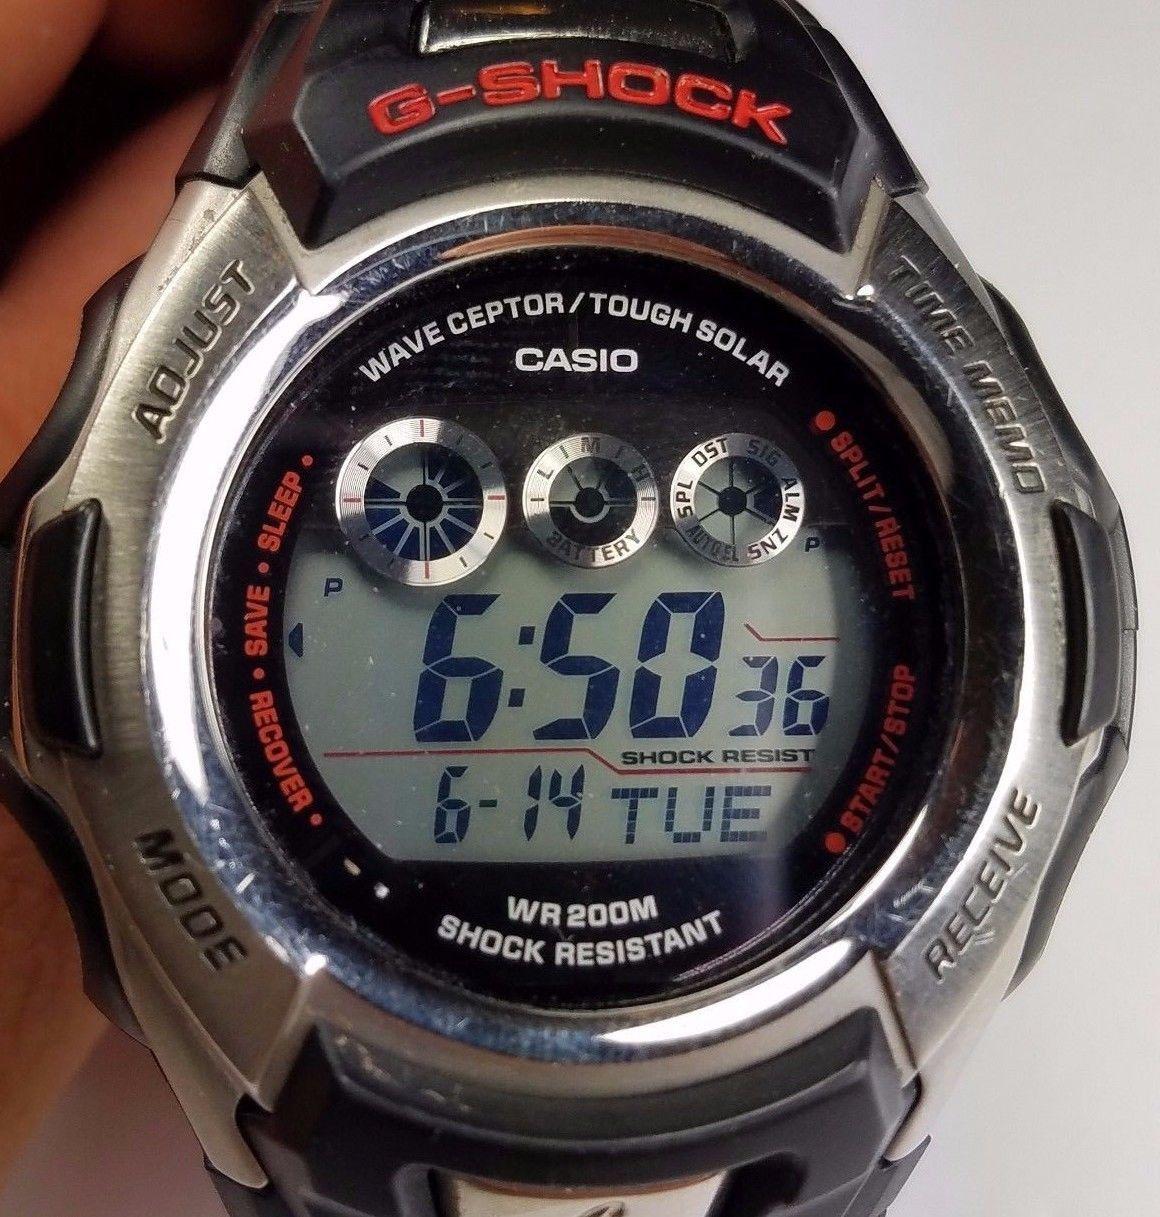 casio g shock gw500a 2688 tough solar wave ceptor men s watch rh pinterest com